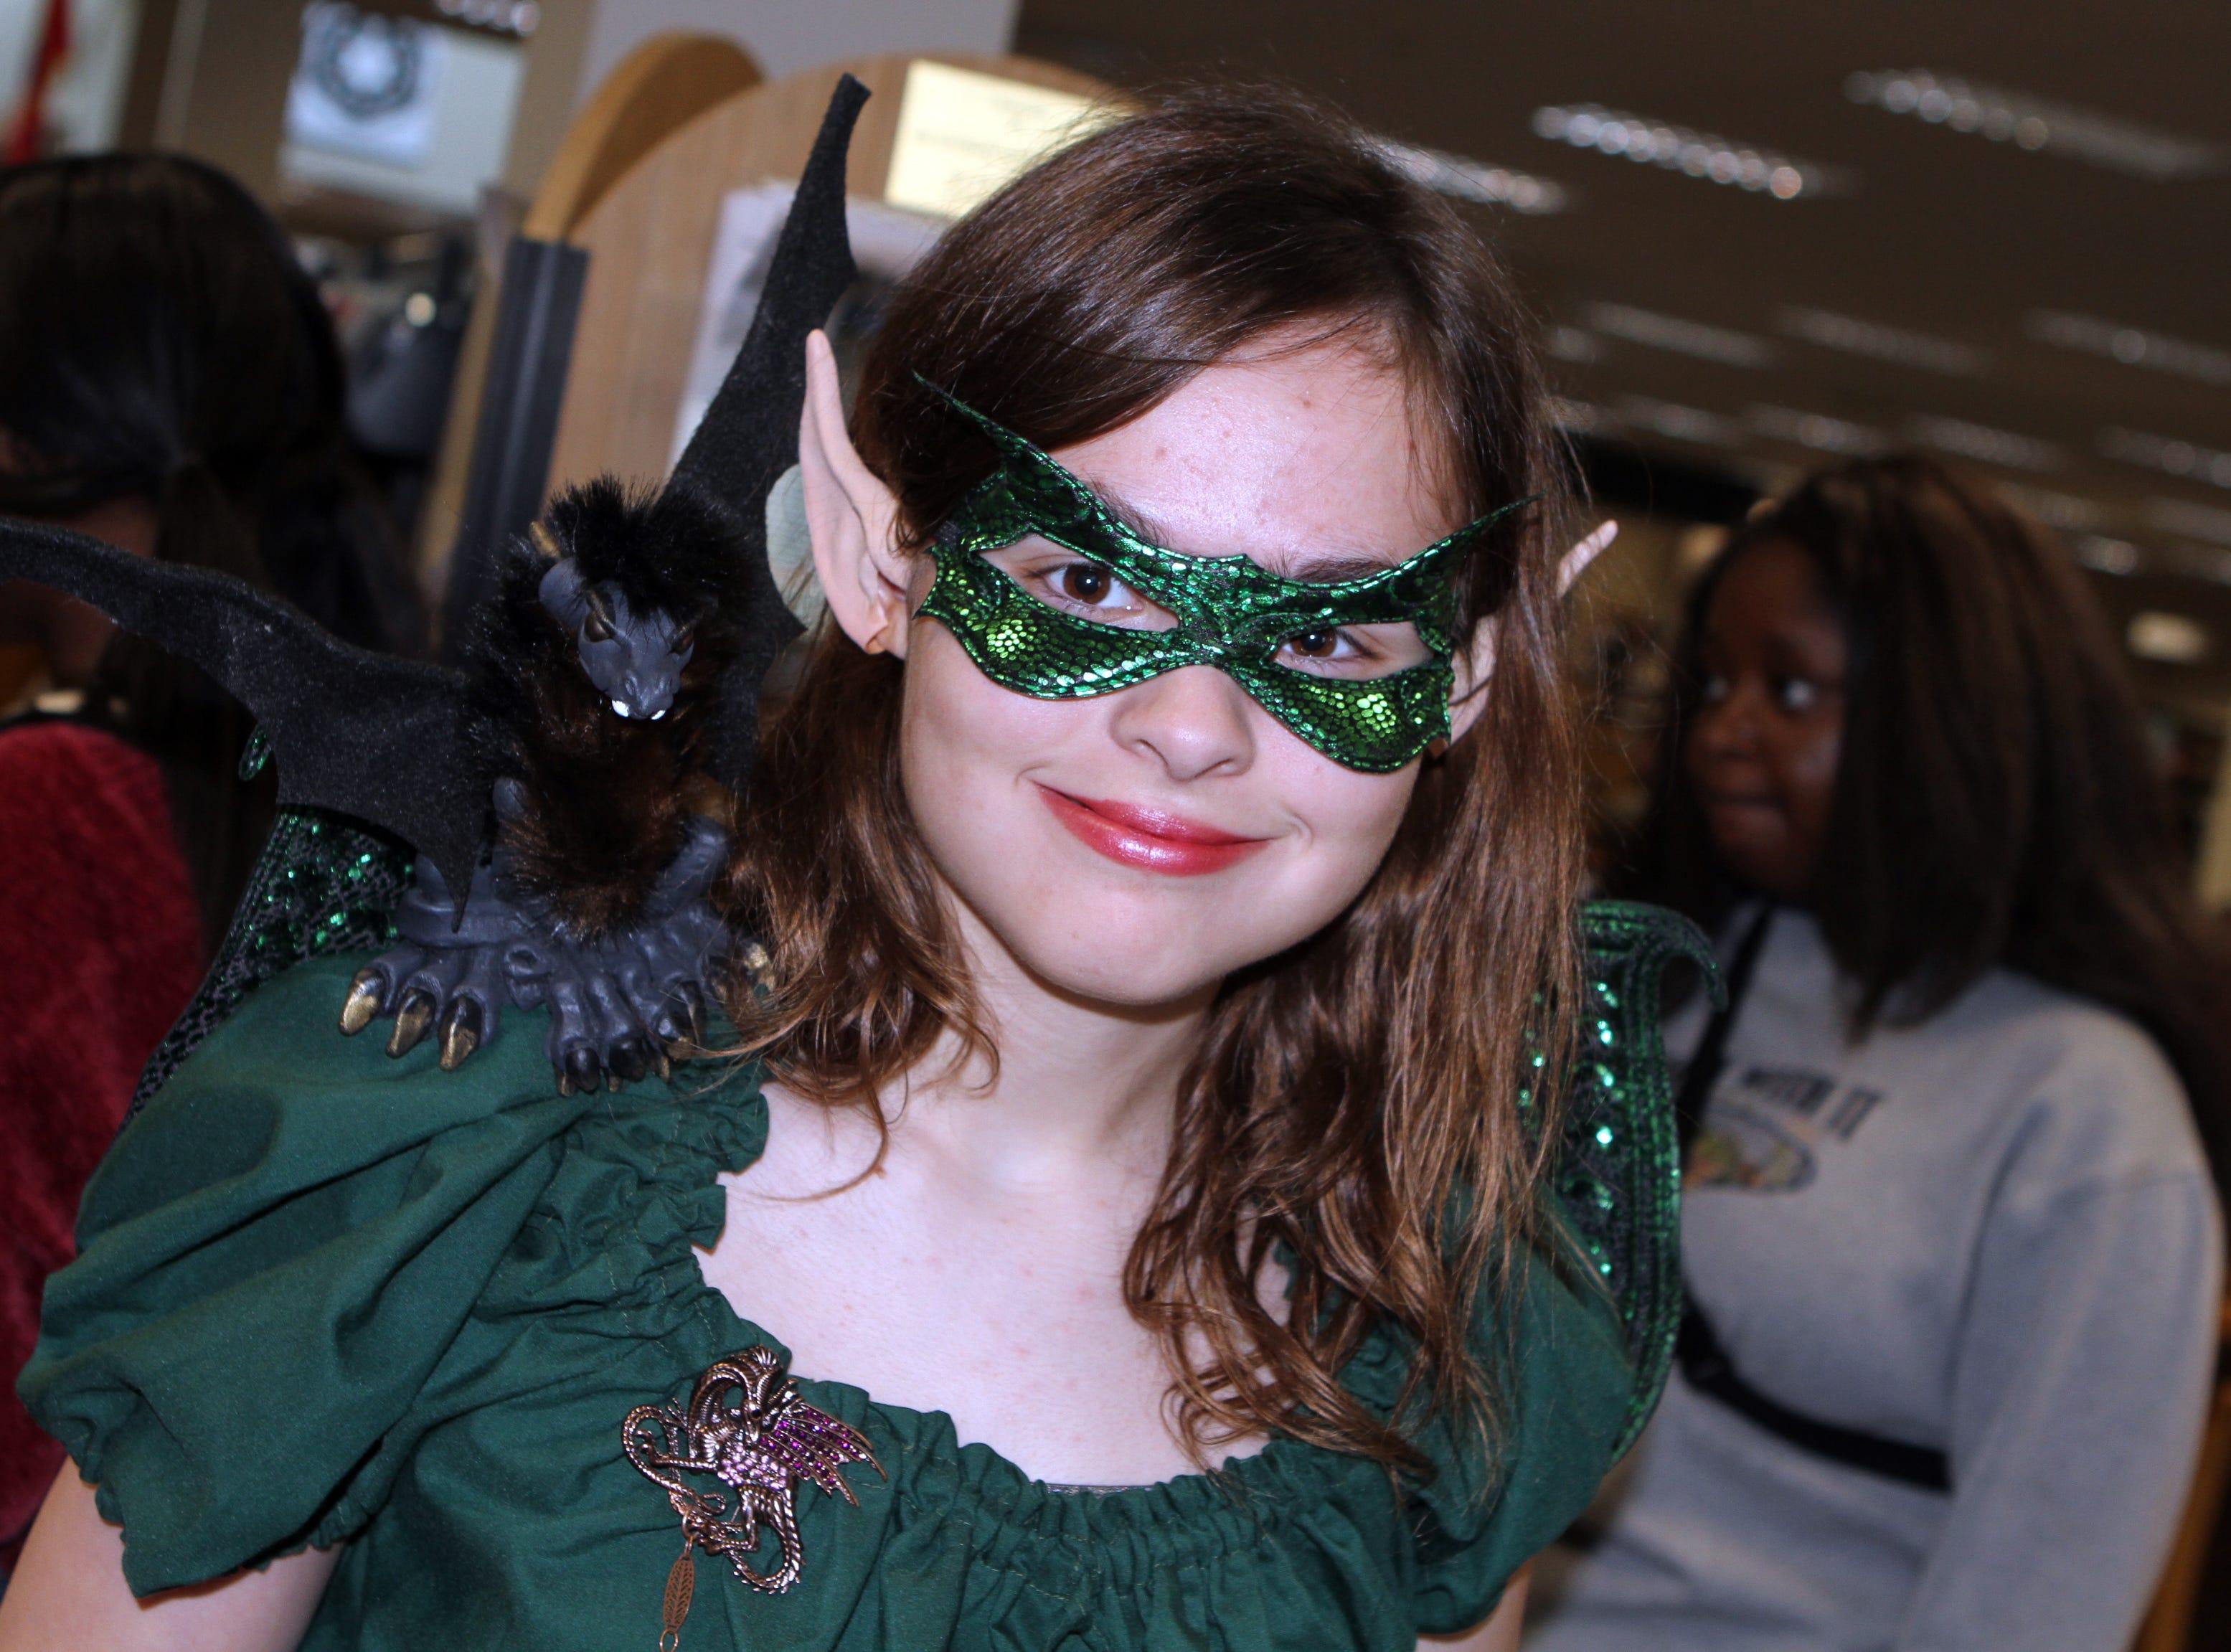 Nora Blake at CMC Public Library's annual Sci-Fi Expo on Saturday, November 3, 2018.